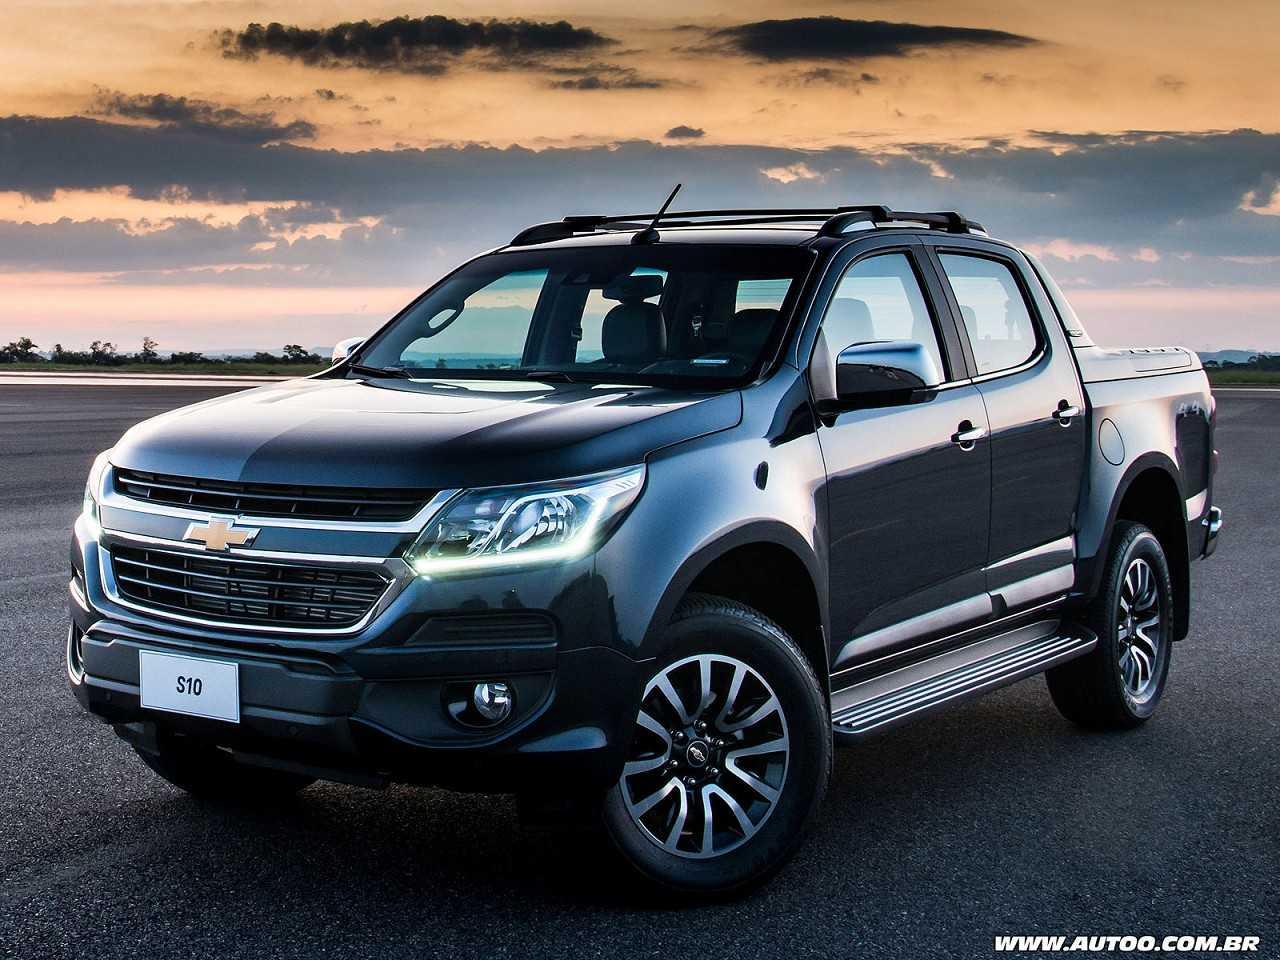 ChevroletS10 2017 - ângulo frontal